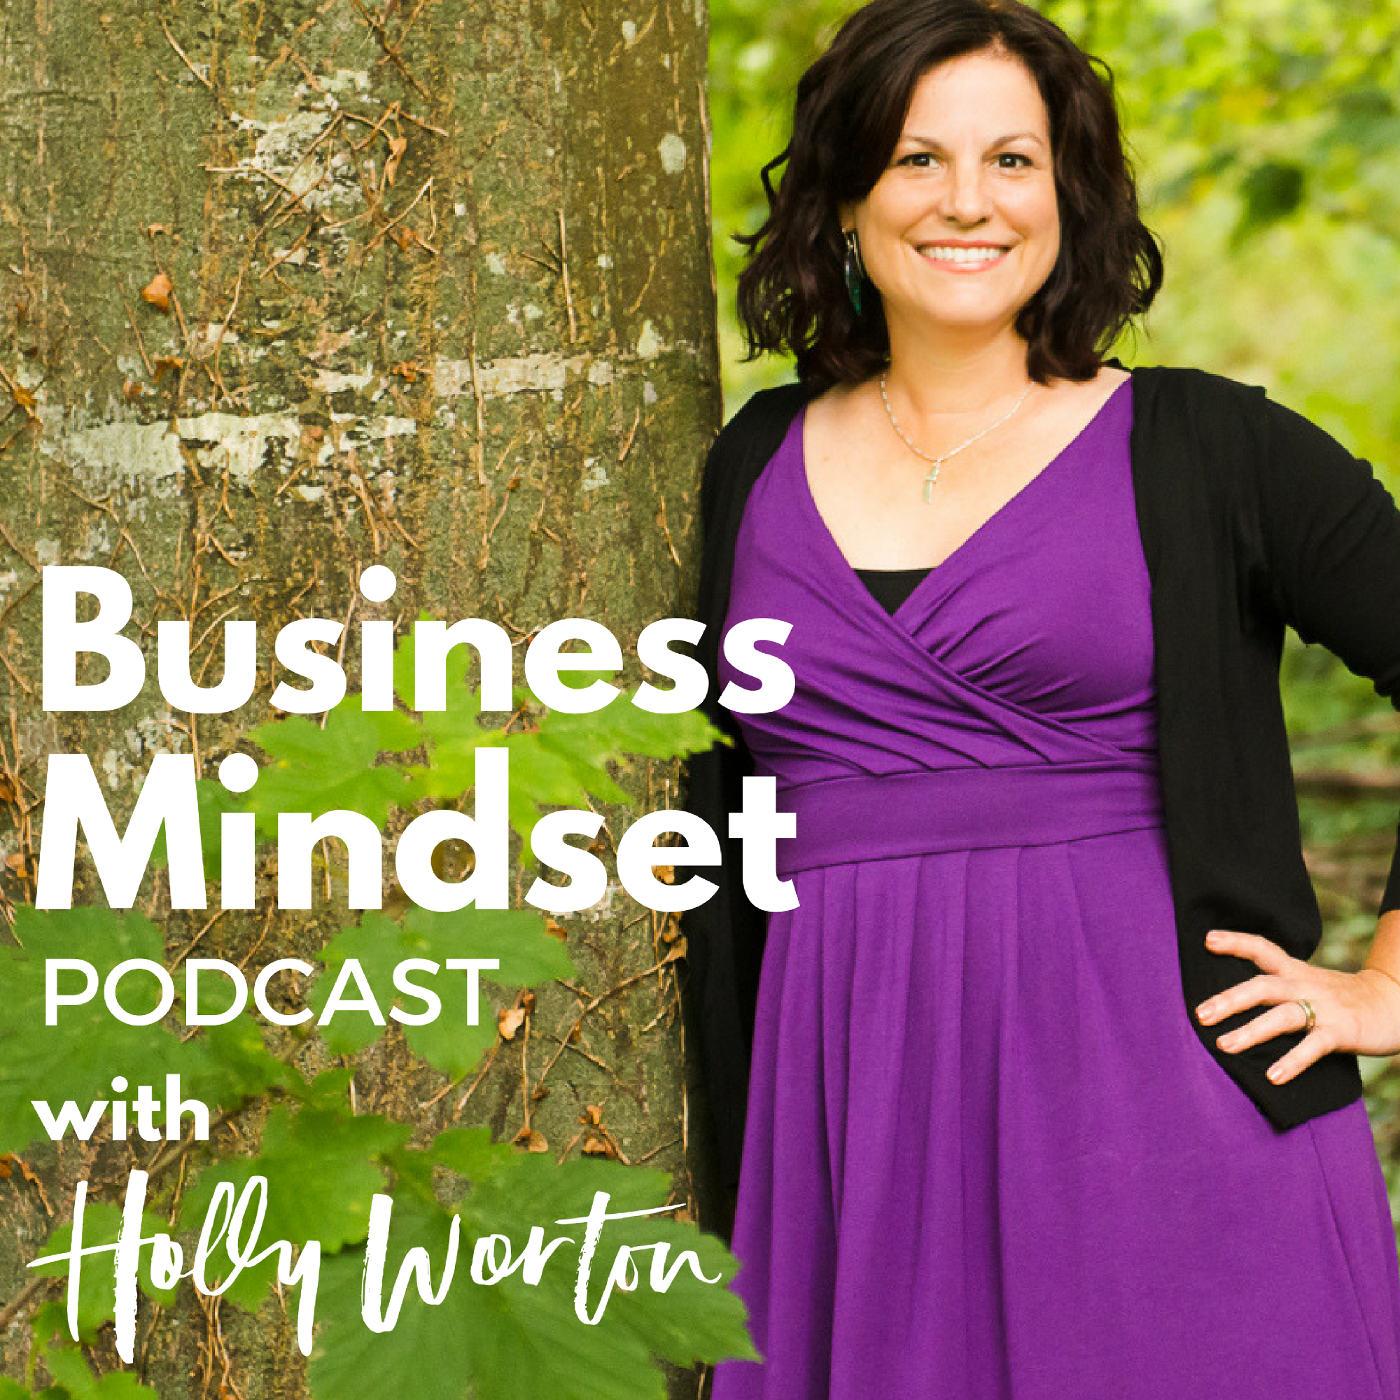 Business Mindset Podcast with Holly Worton| Business Mindset for Women Entrepreneurs